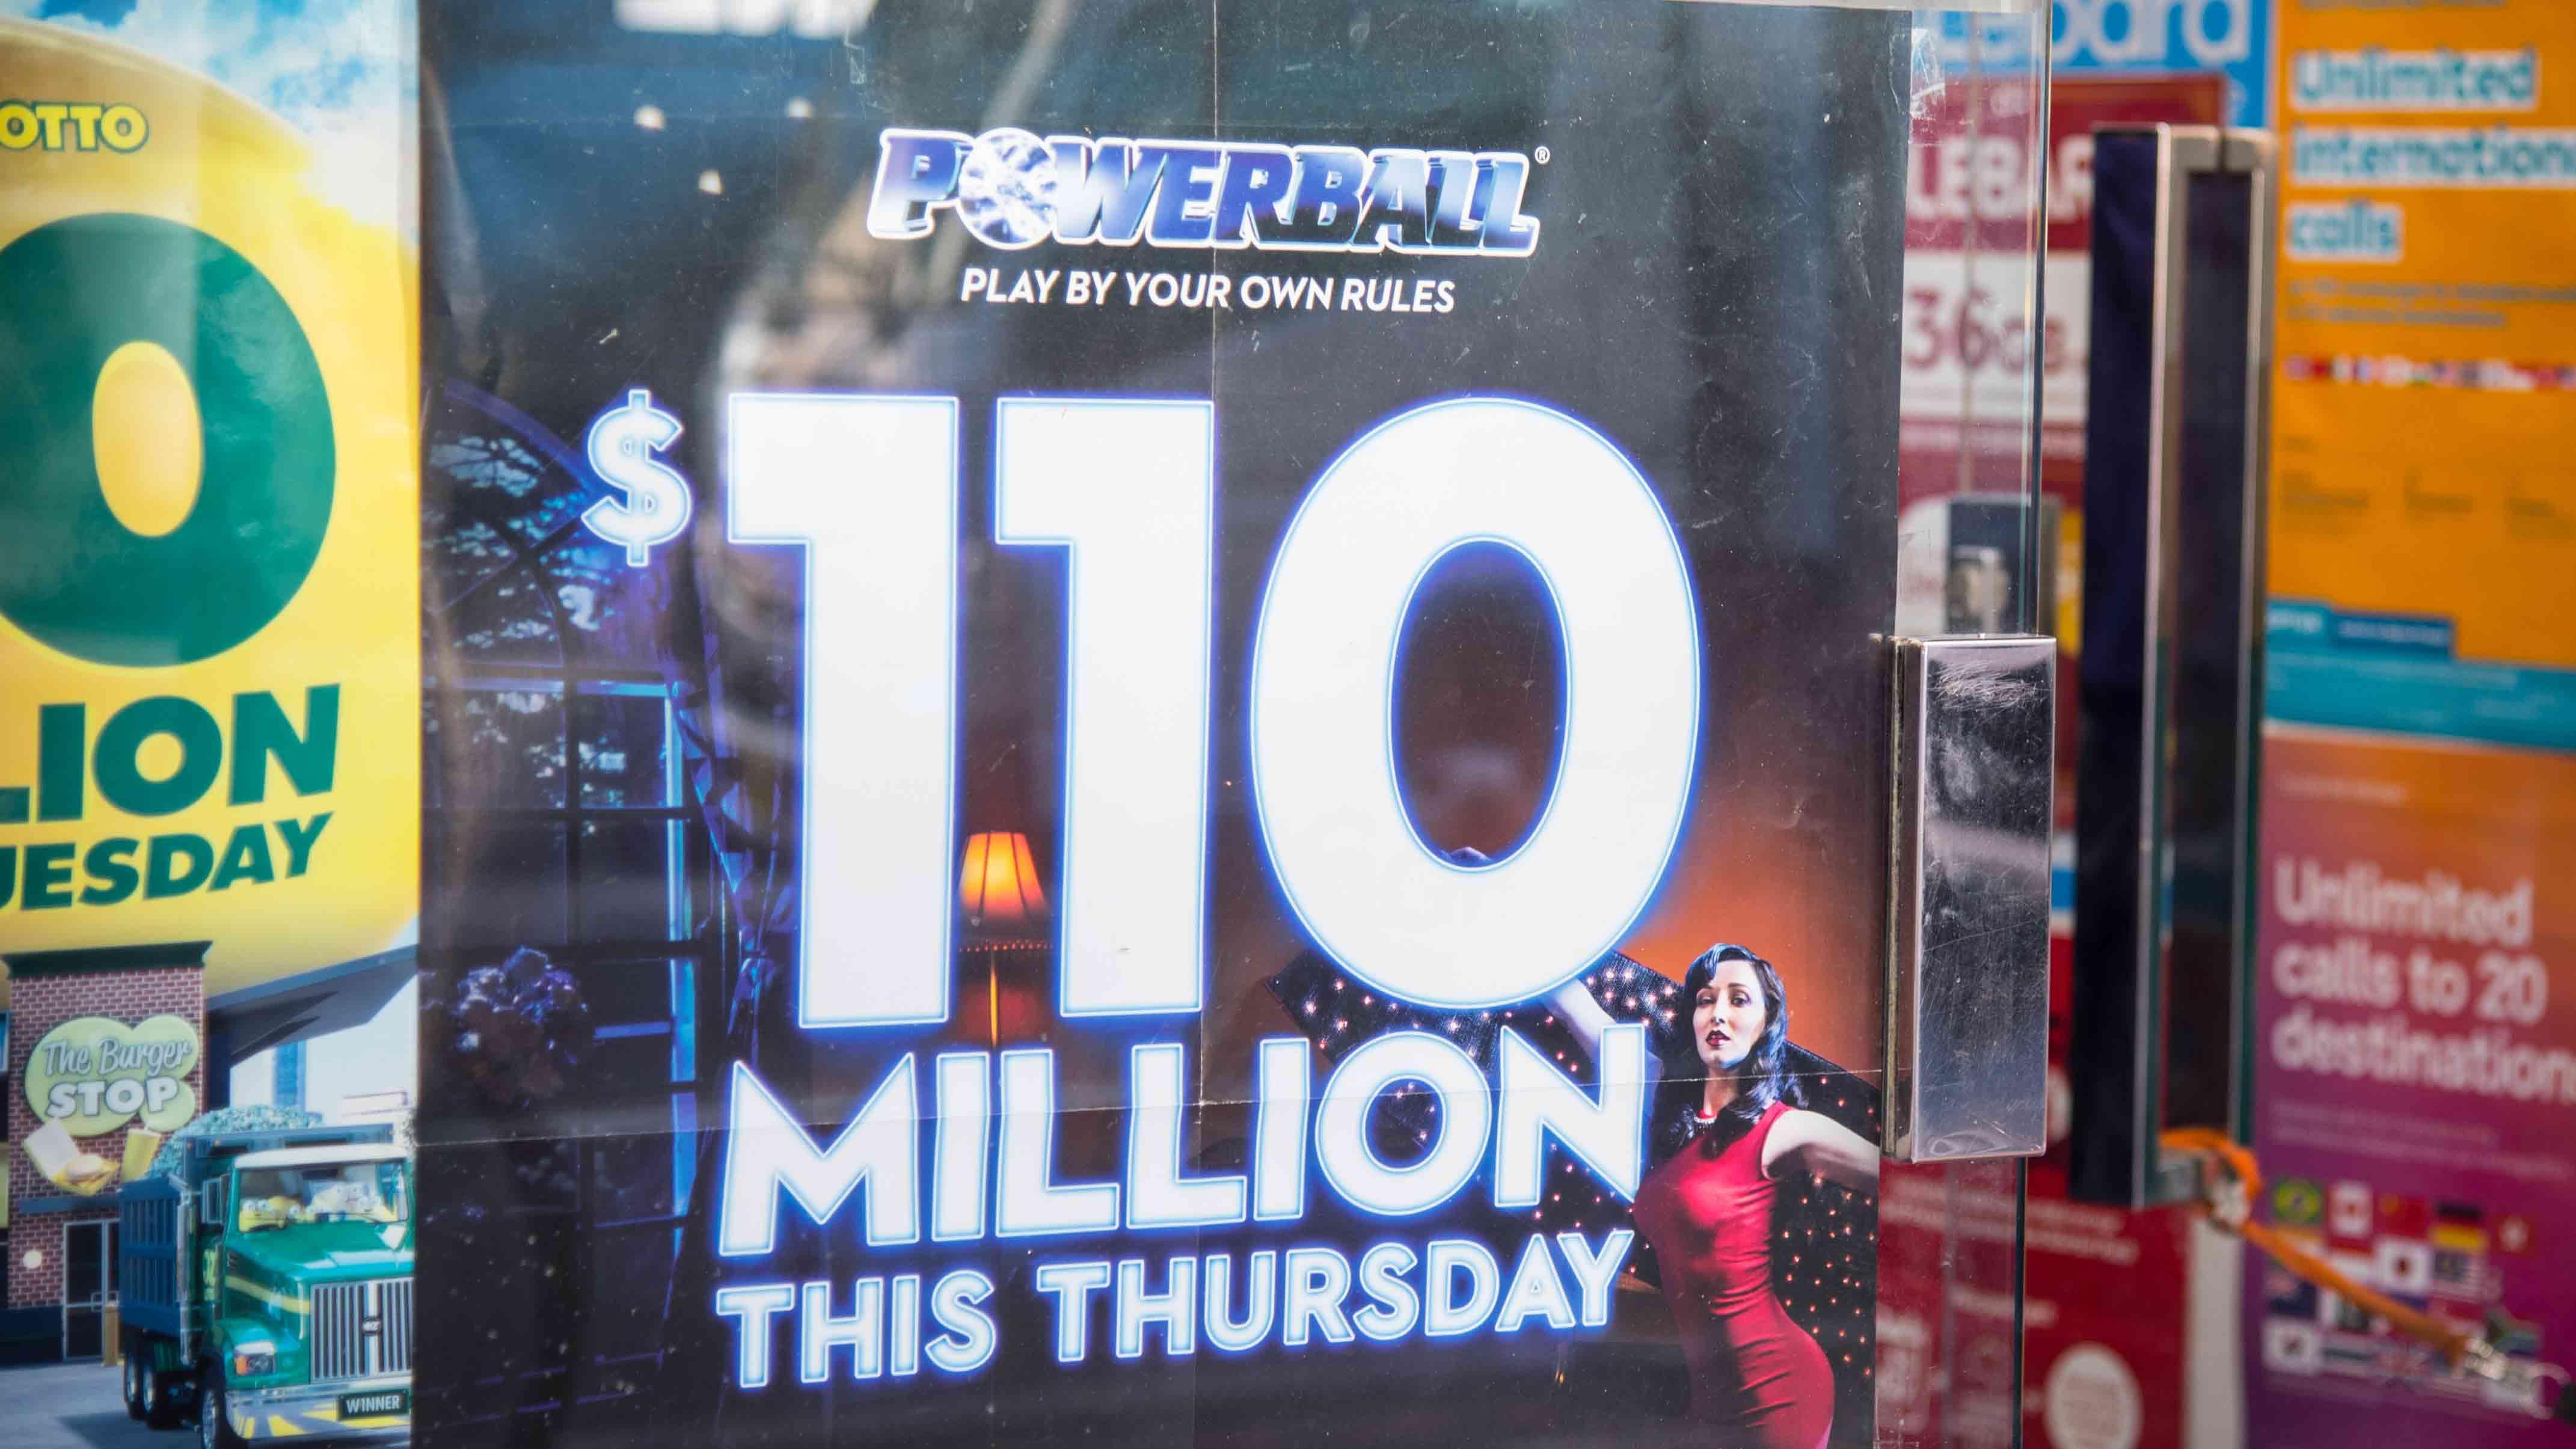 Adelaide man's insane $110 million Powerball bonanza – wins 20 times!